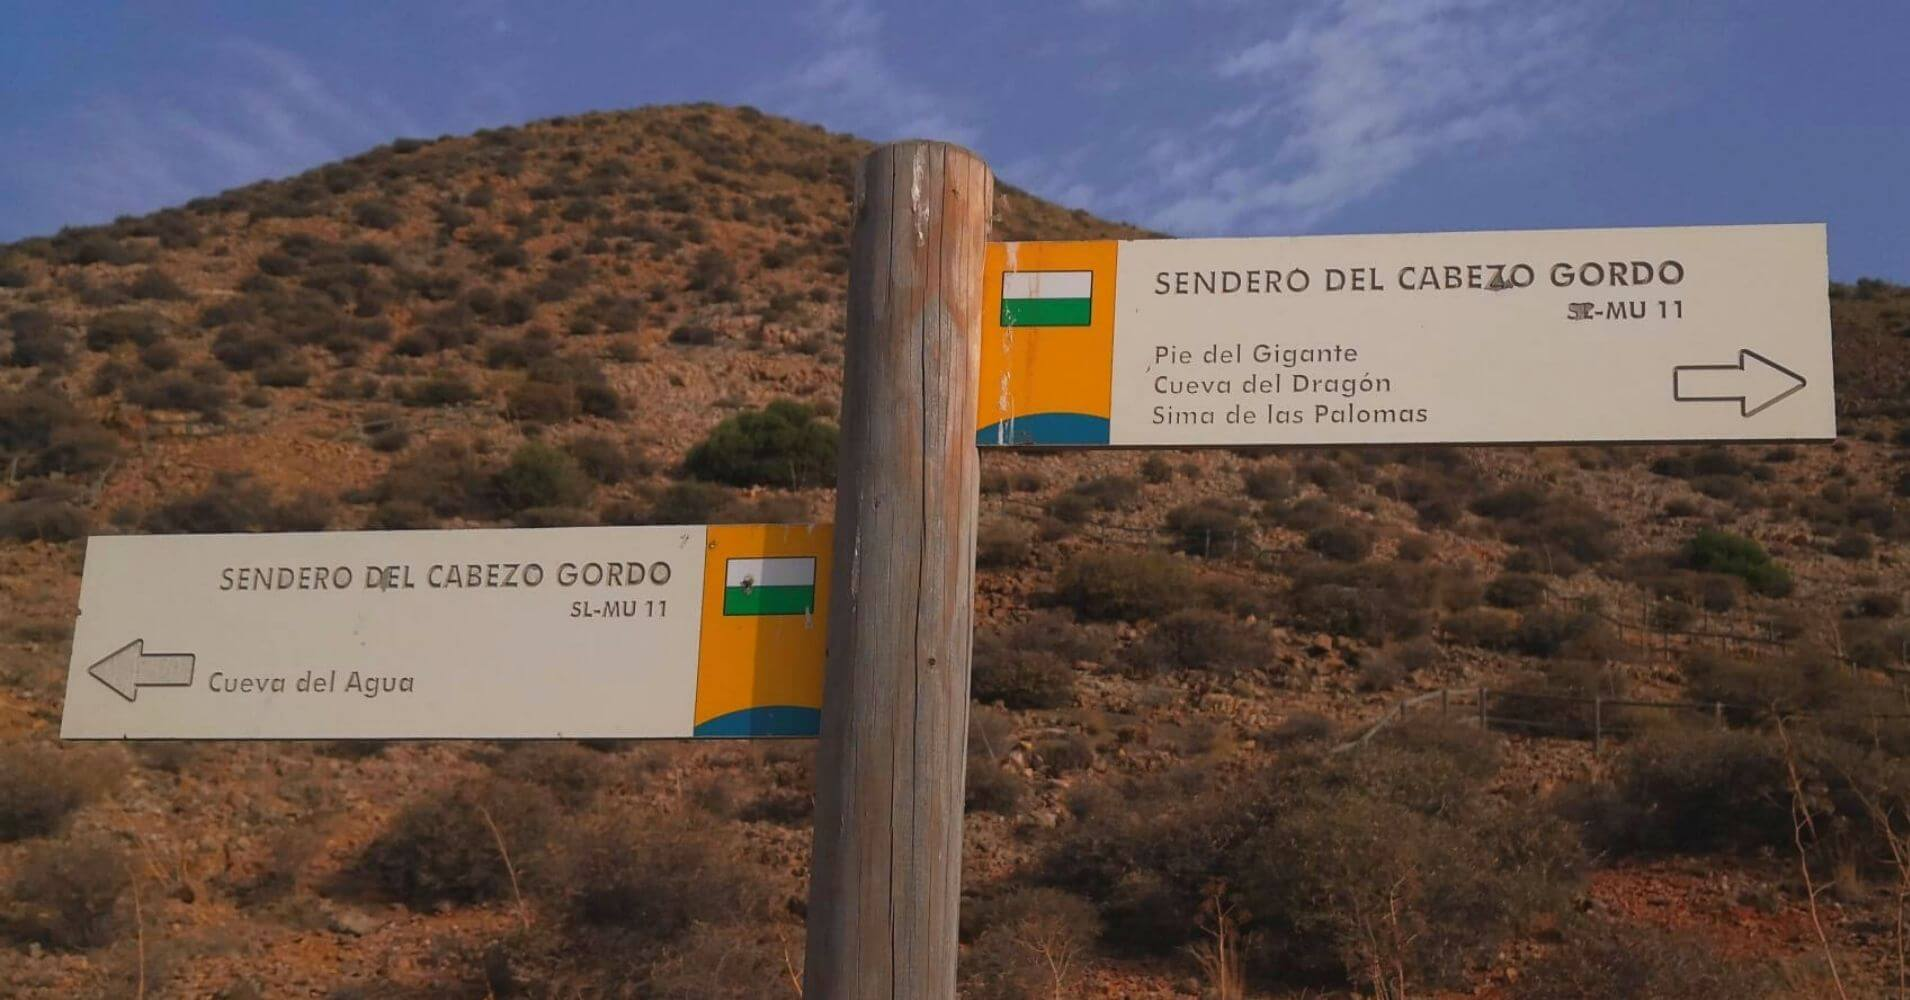 Sendero Local SL-MU 11 Cabezo Gordo. Torre Pacheco, Murcia.